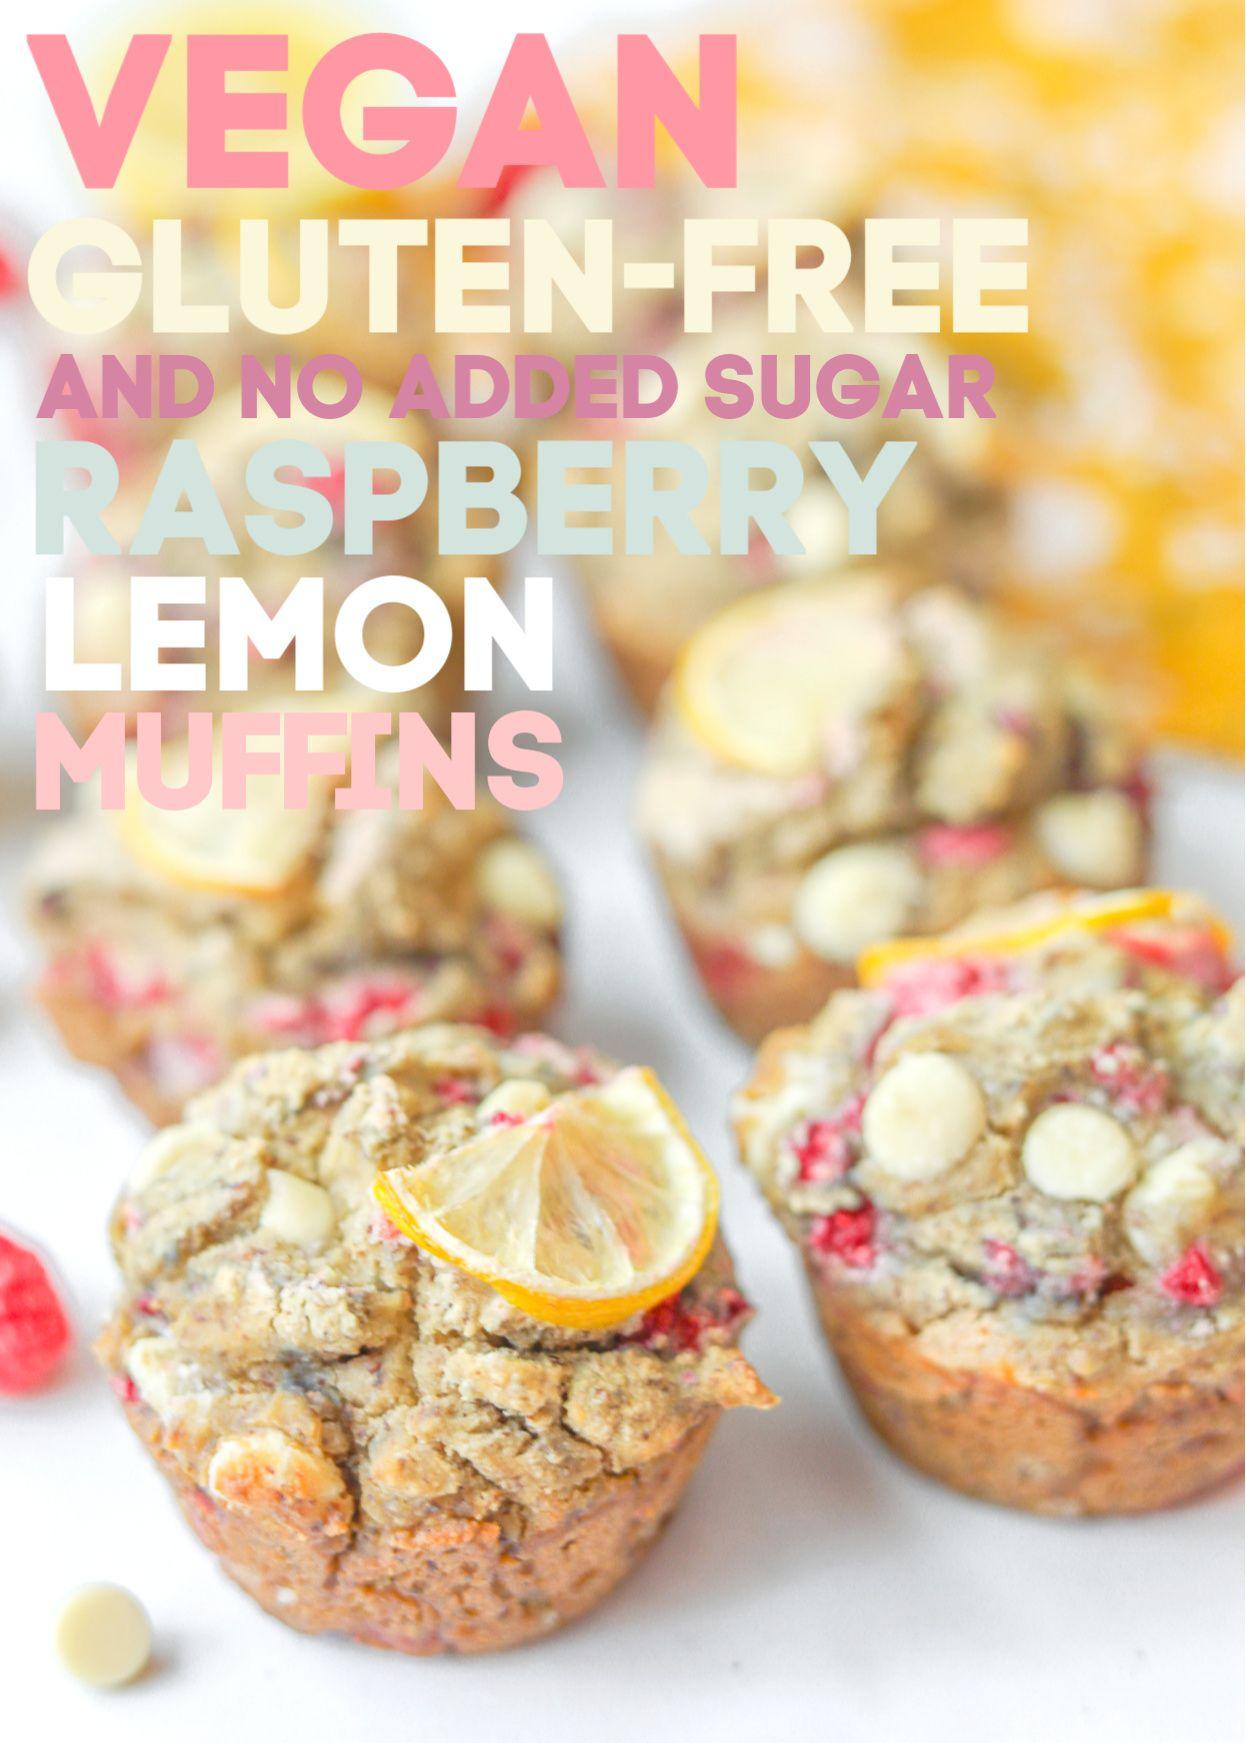 Gluten Free White Chocolate Raspberry Lemon Muffins Simply Taralynn Recipe Lemon Raspberry Muffins Lemon Muffins Raspberry And White Chocolate Muffins